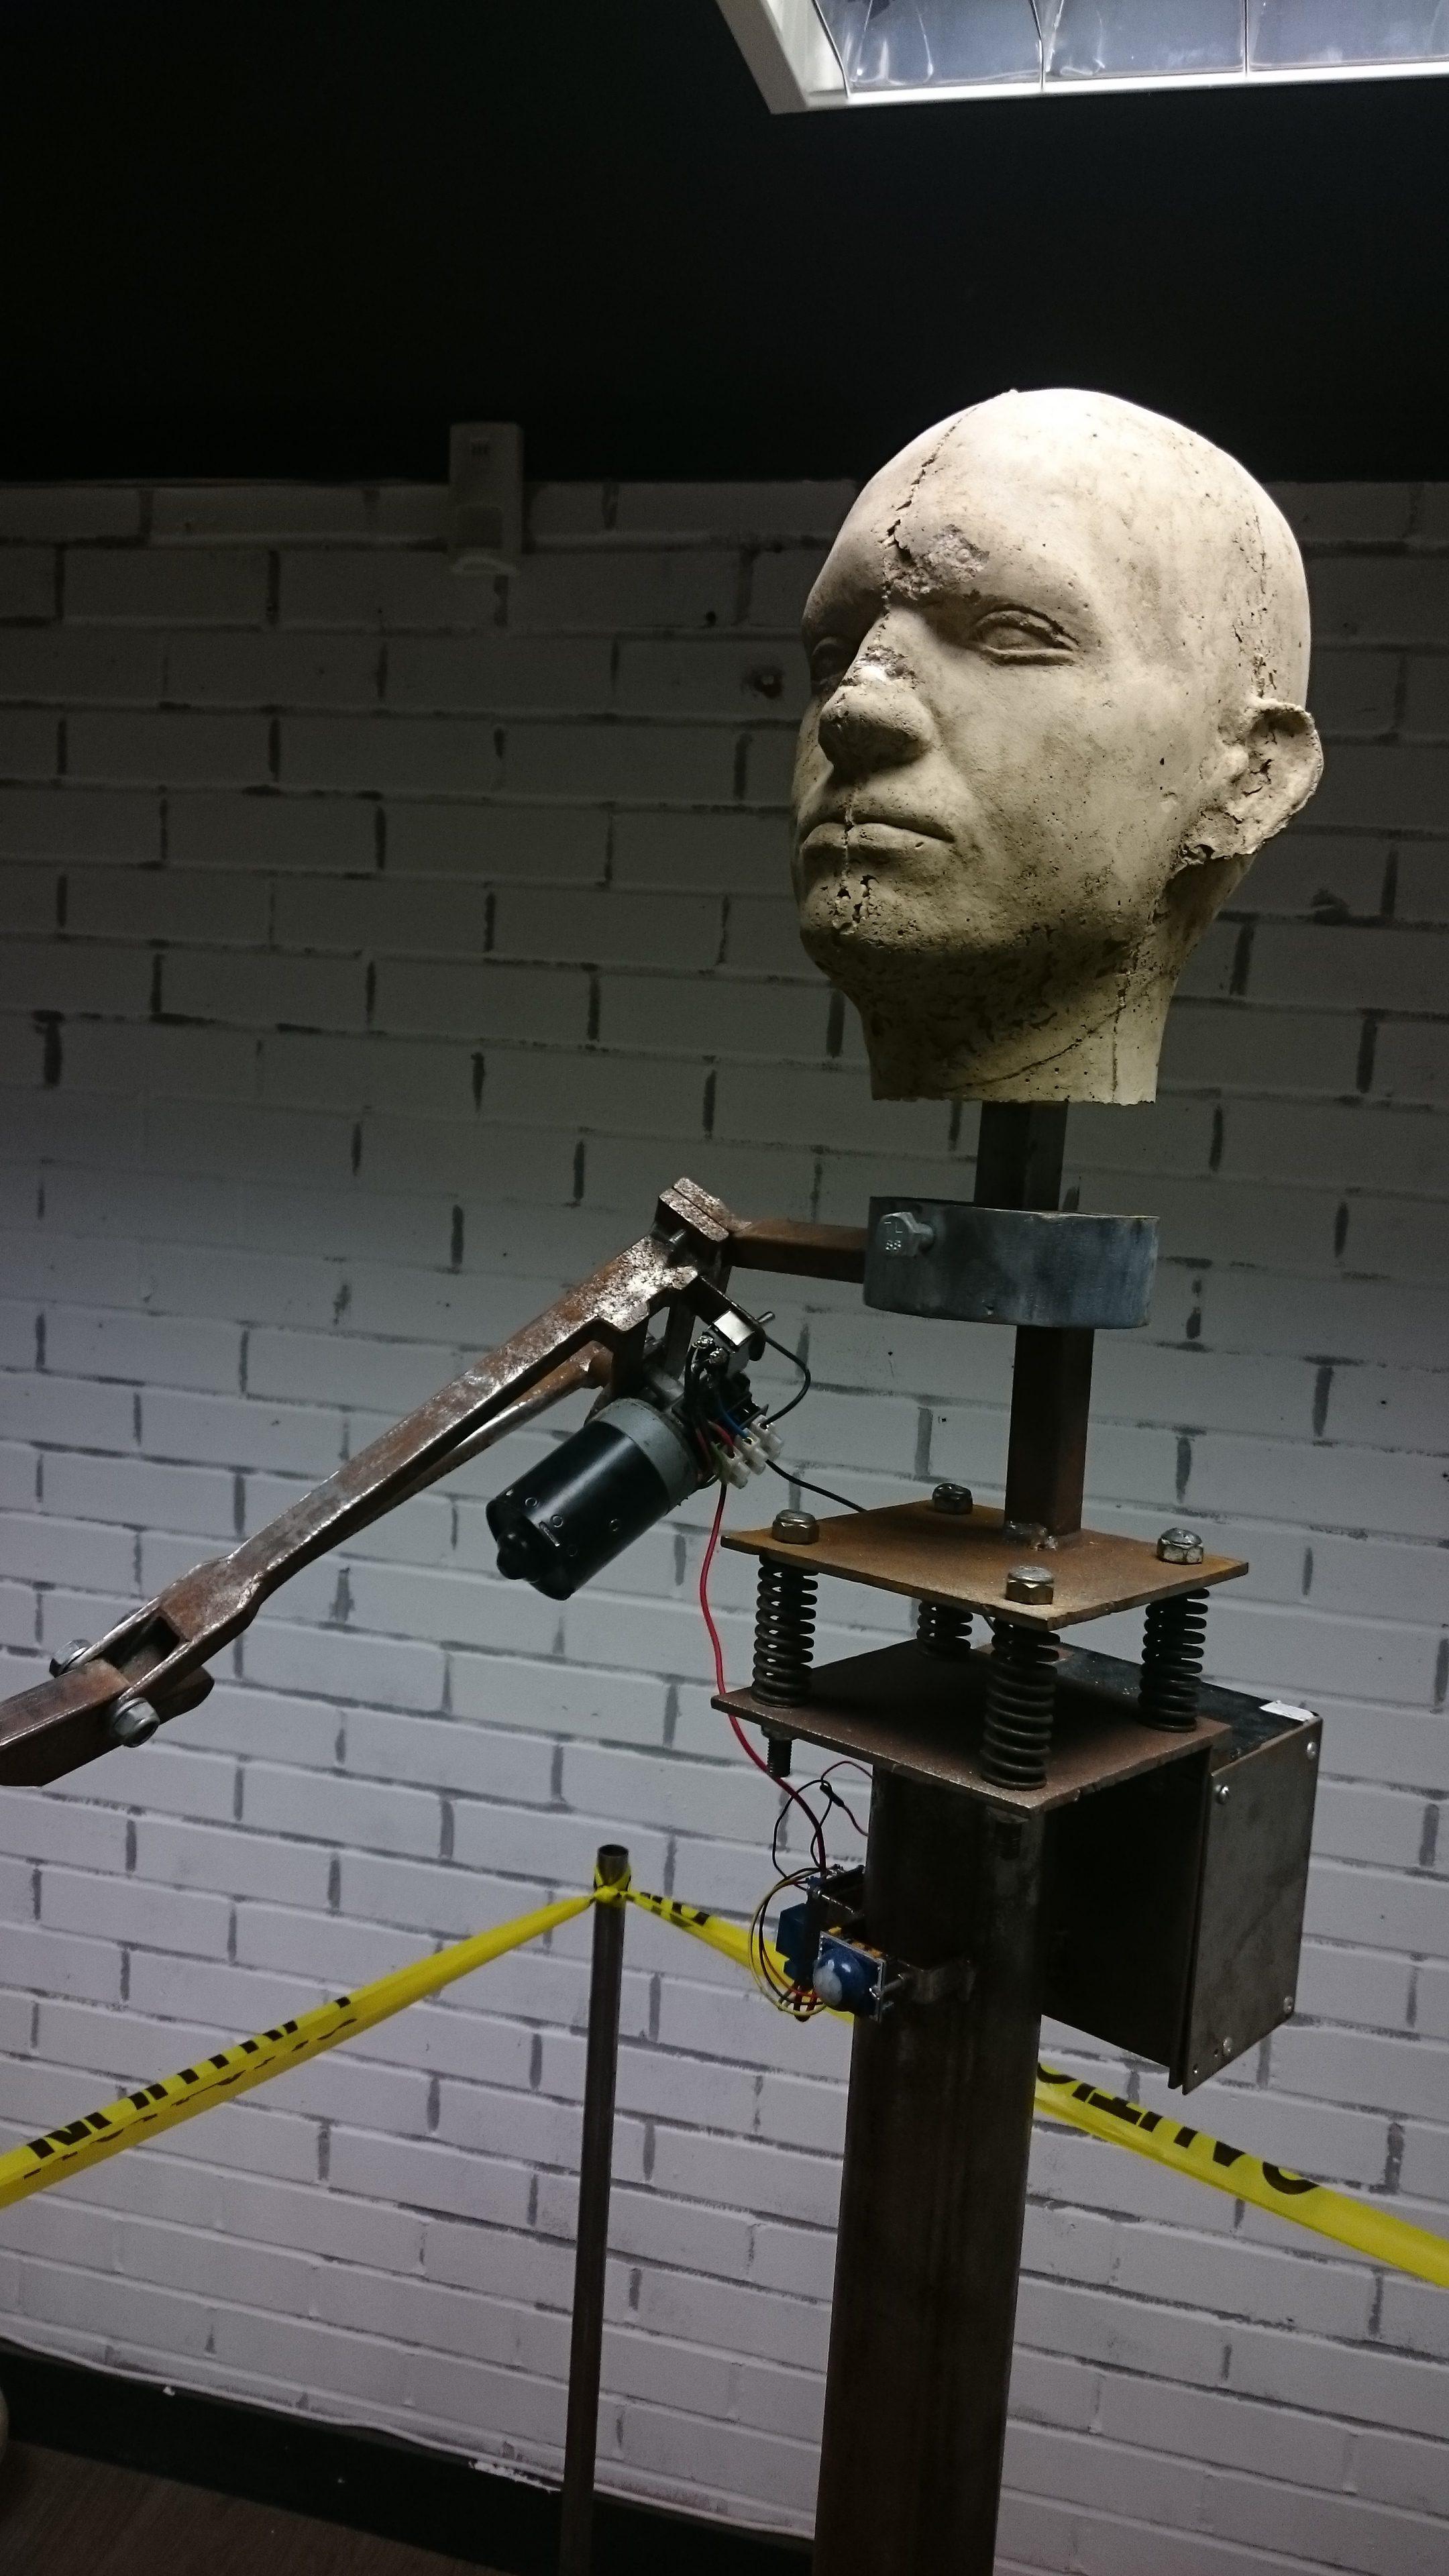 Kinetic sculpture 'Prothesis' by Luke Tupper